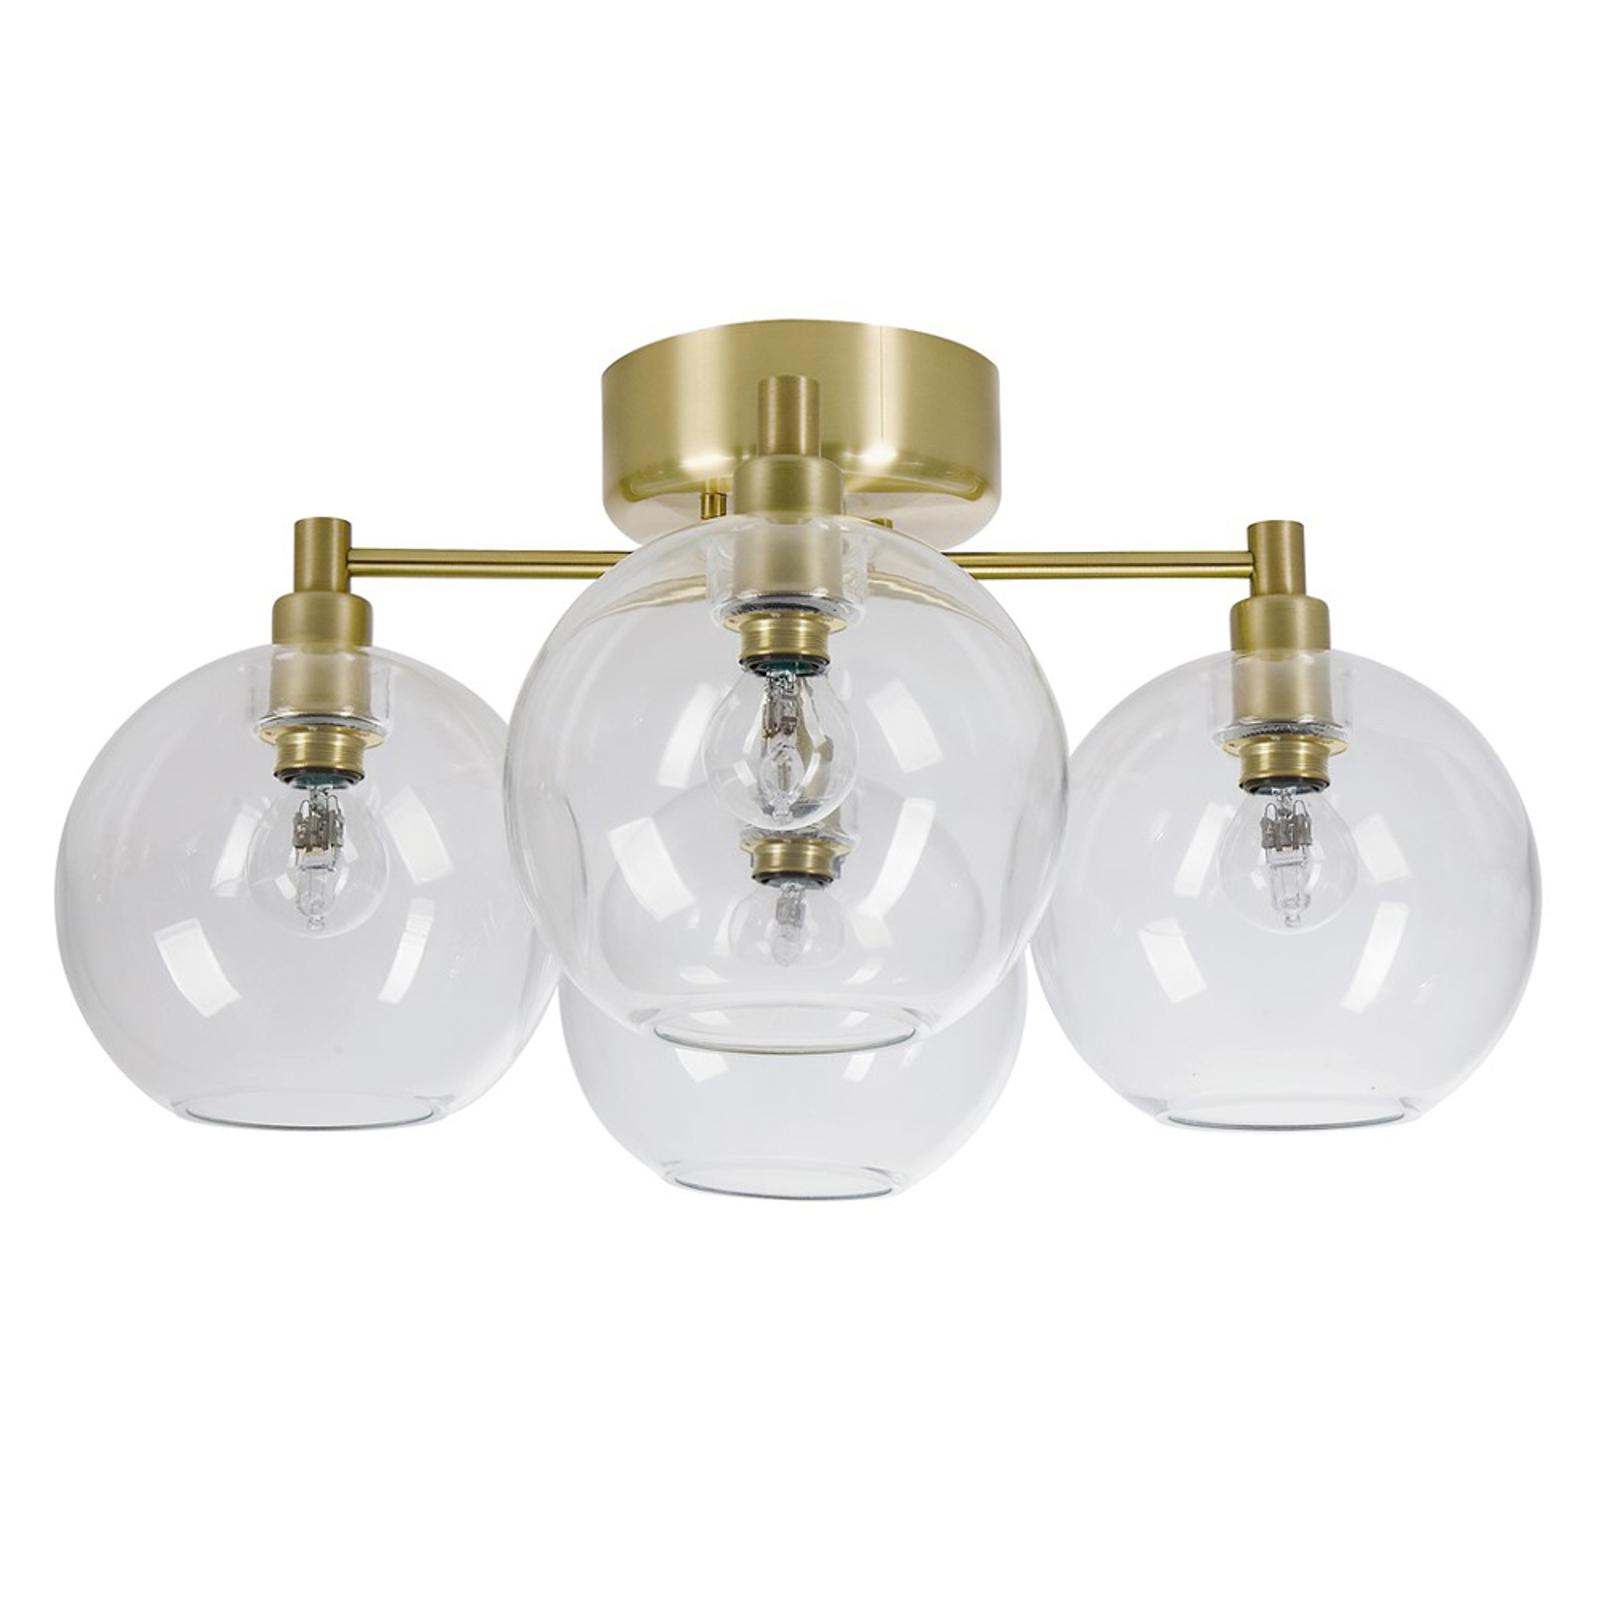 Gloria glas-loftlampe med fire lyskilder